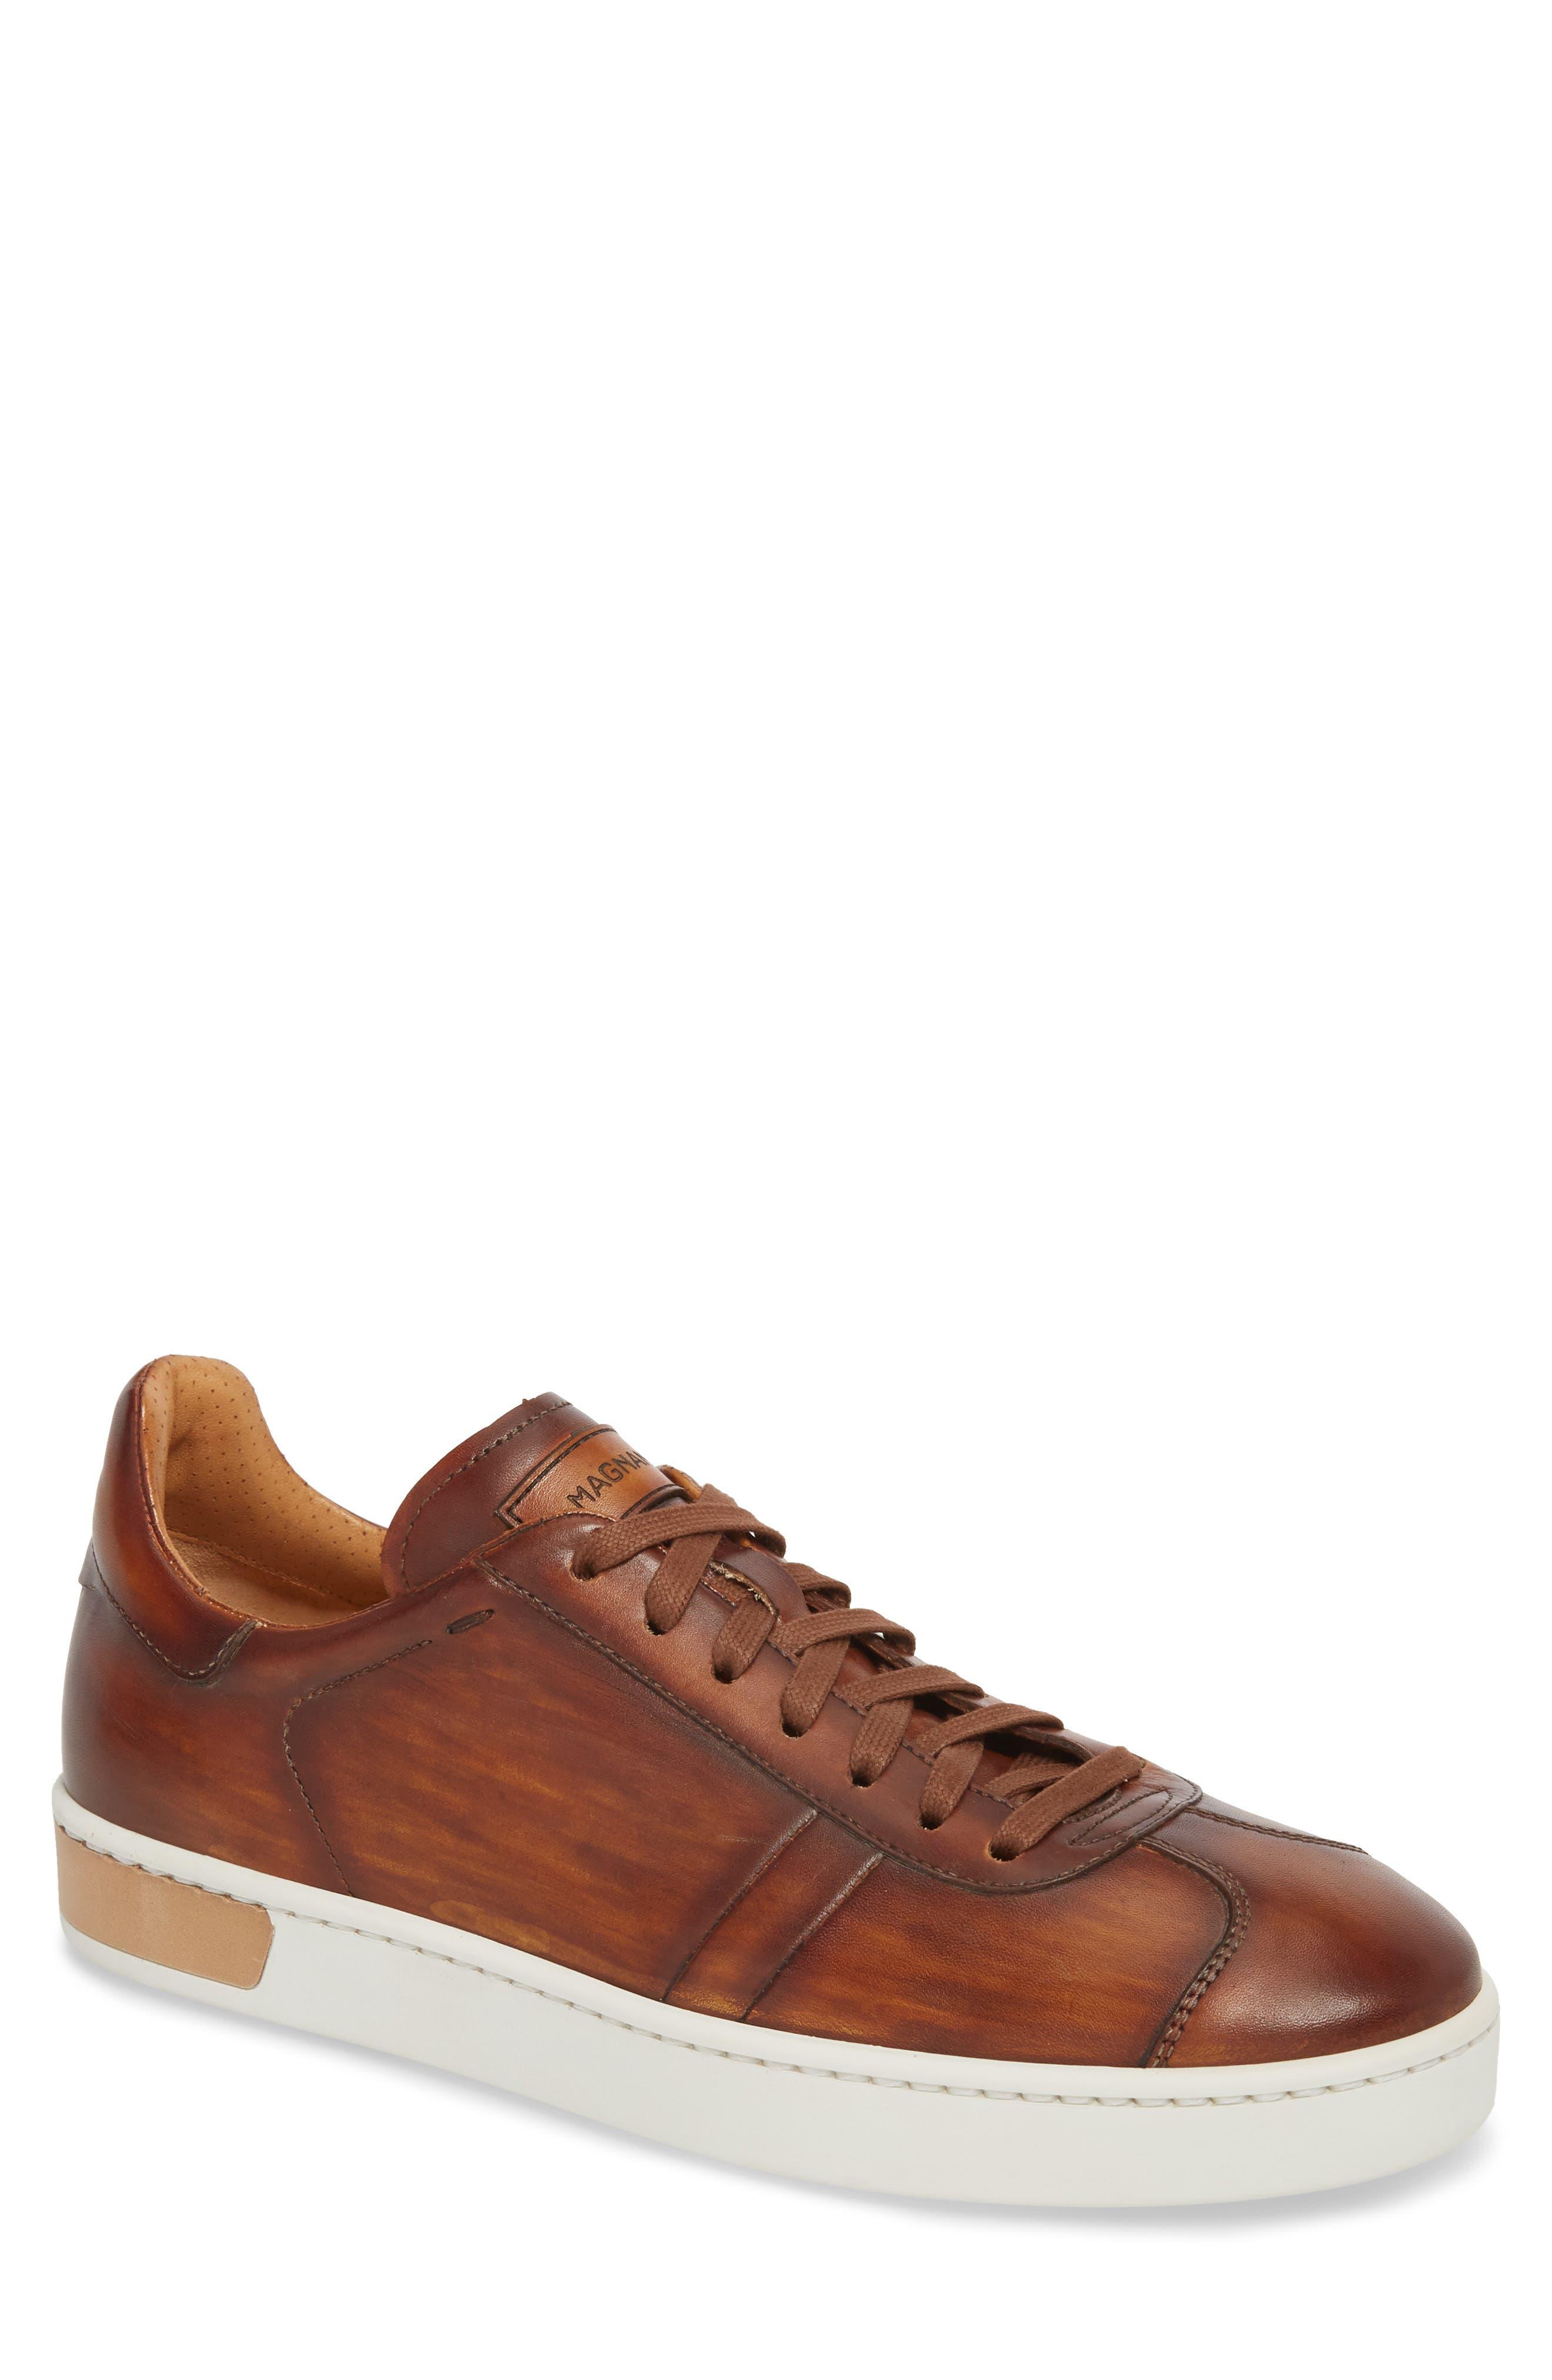 Gunner Low Top Sneaker,                         Main,                         color, Cuero Leather